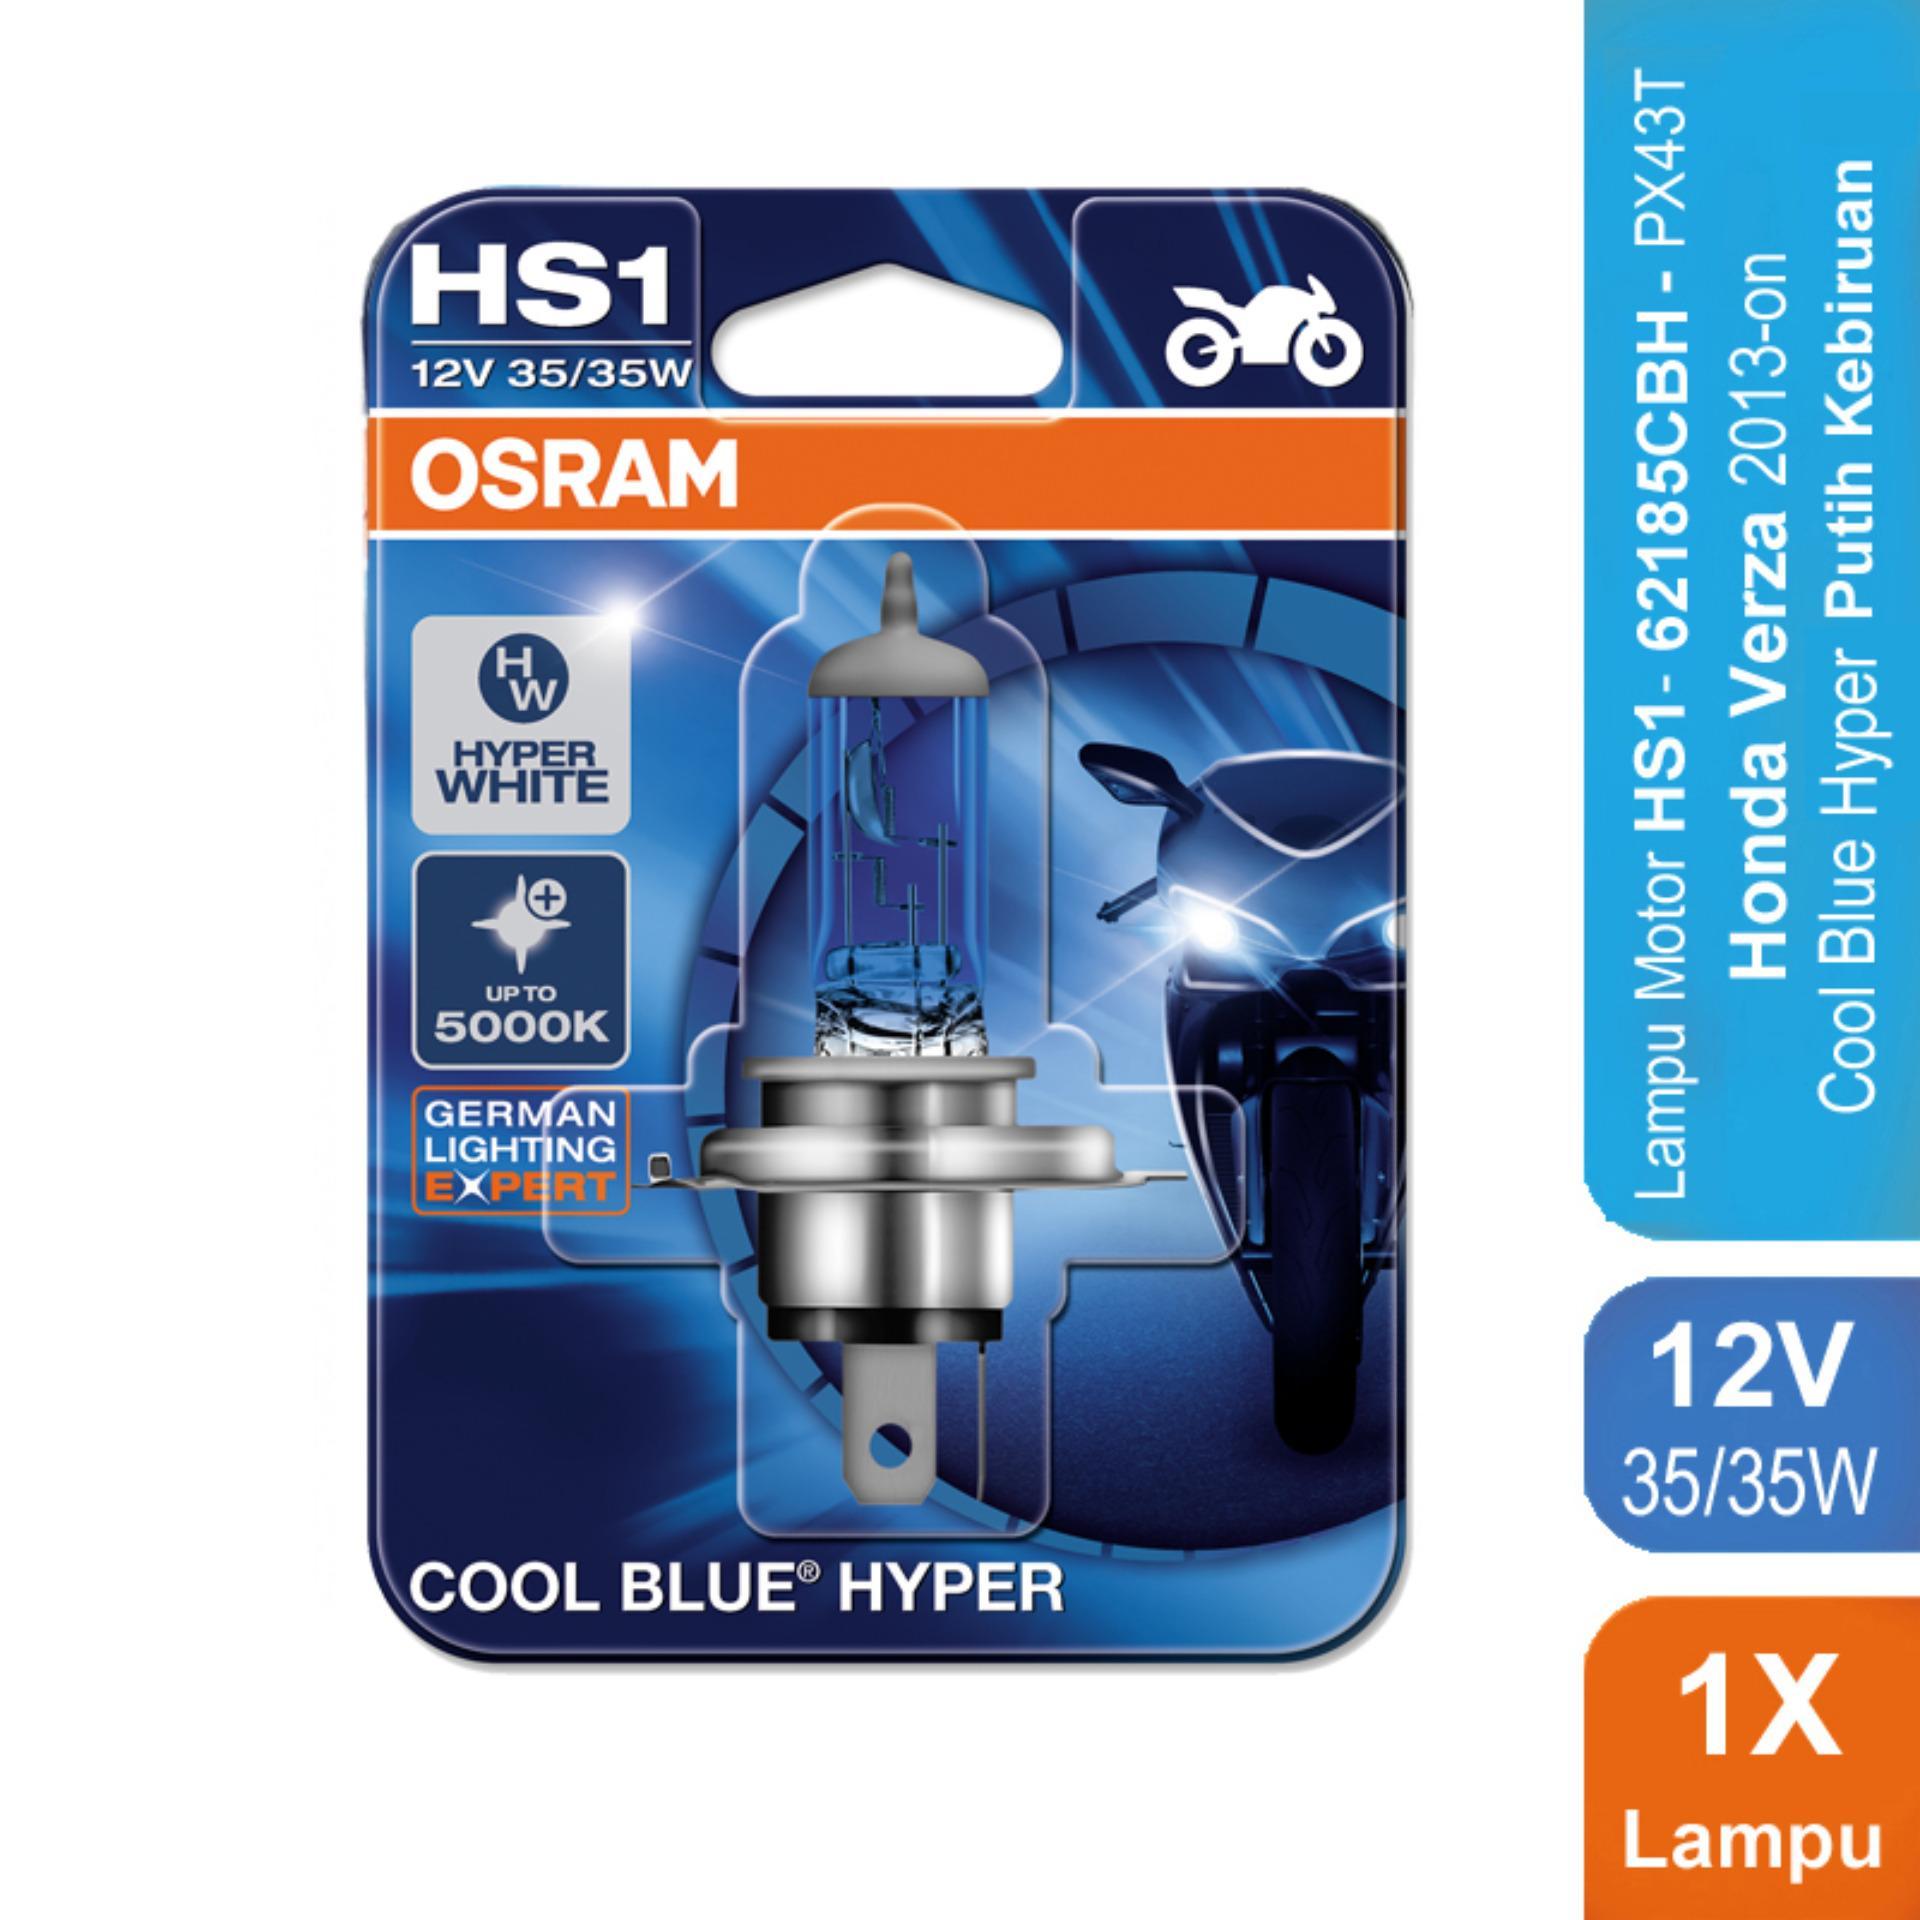 Osram Lampu Motor Honda Verza 2013-on - HS1 62185CBH 12V 35/35 - Cool Blue Hyper